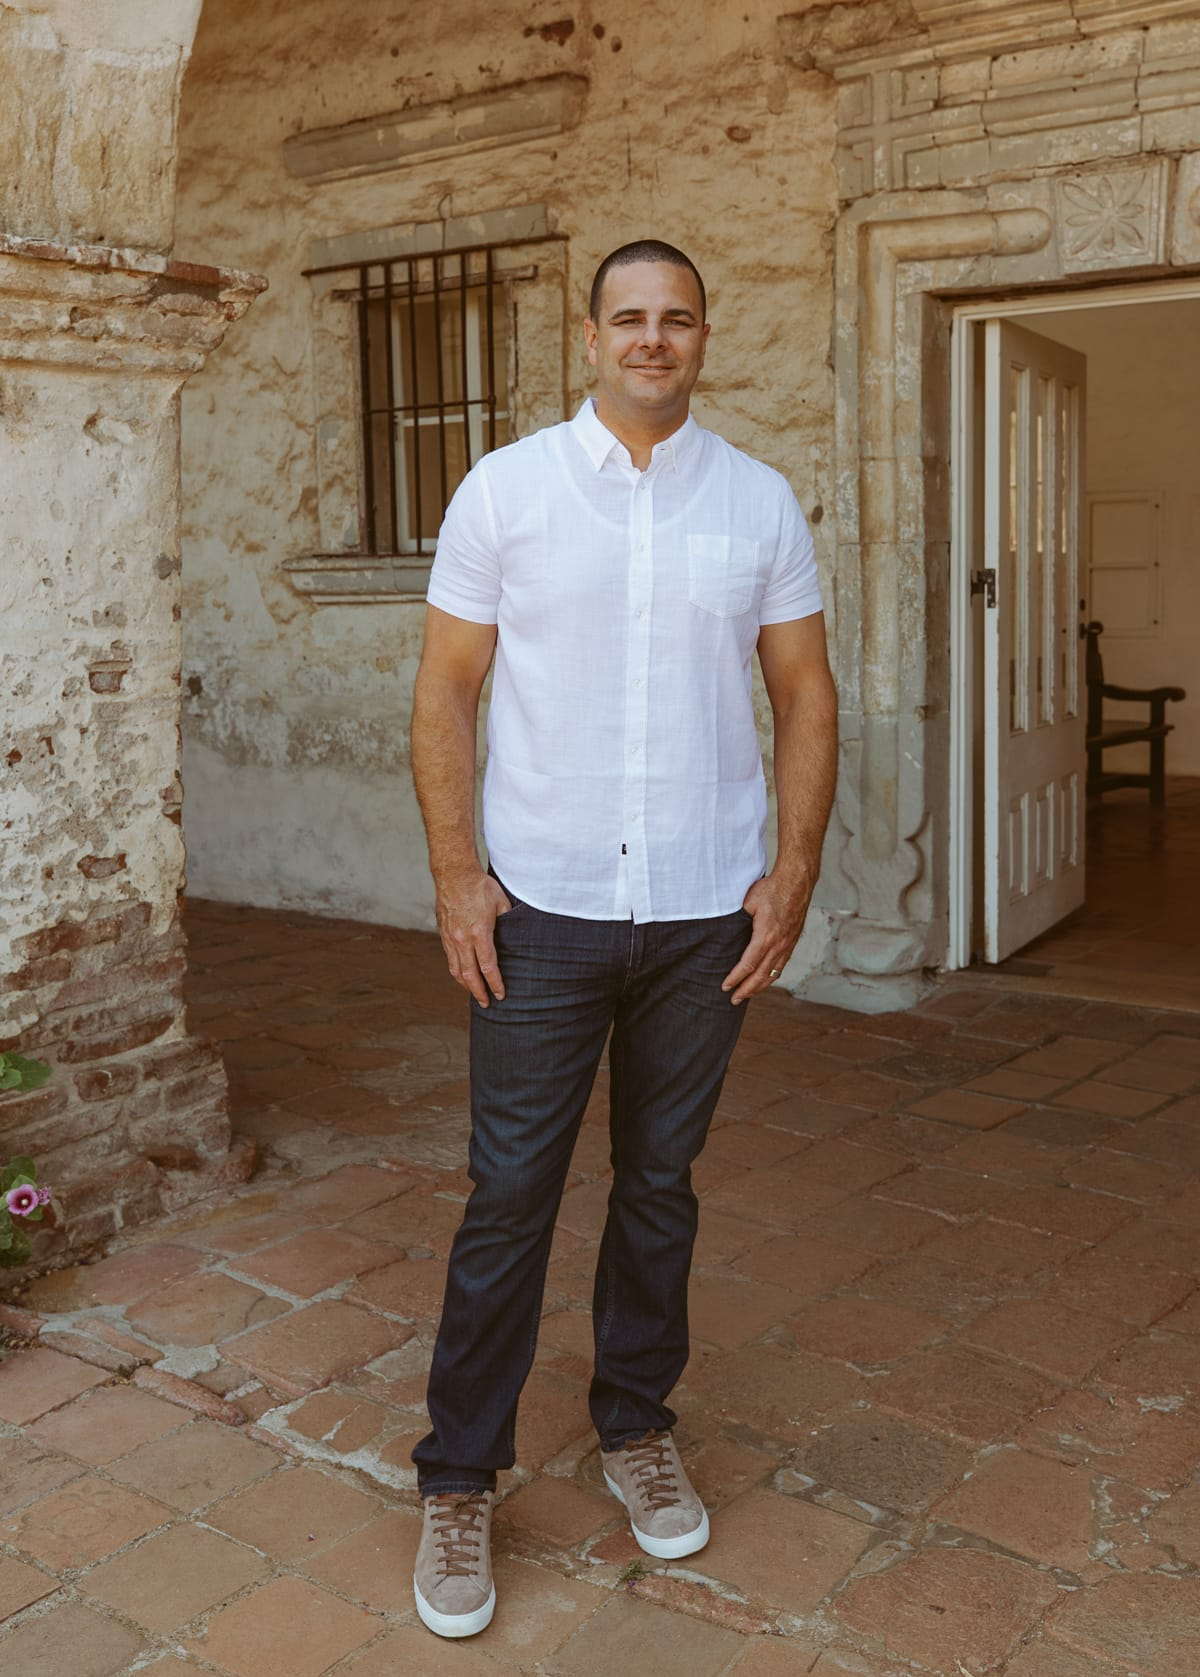 nordstrom anniversary sale men's clothes